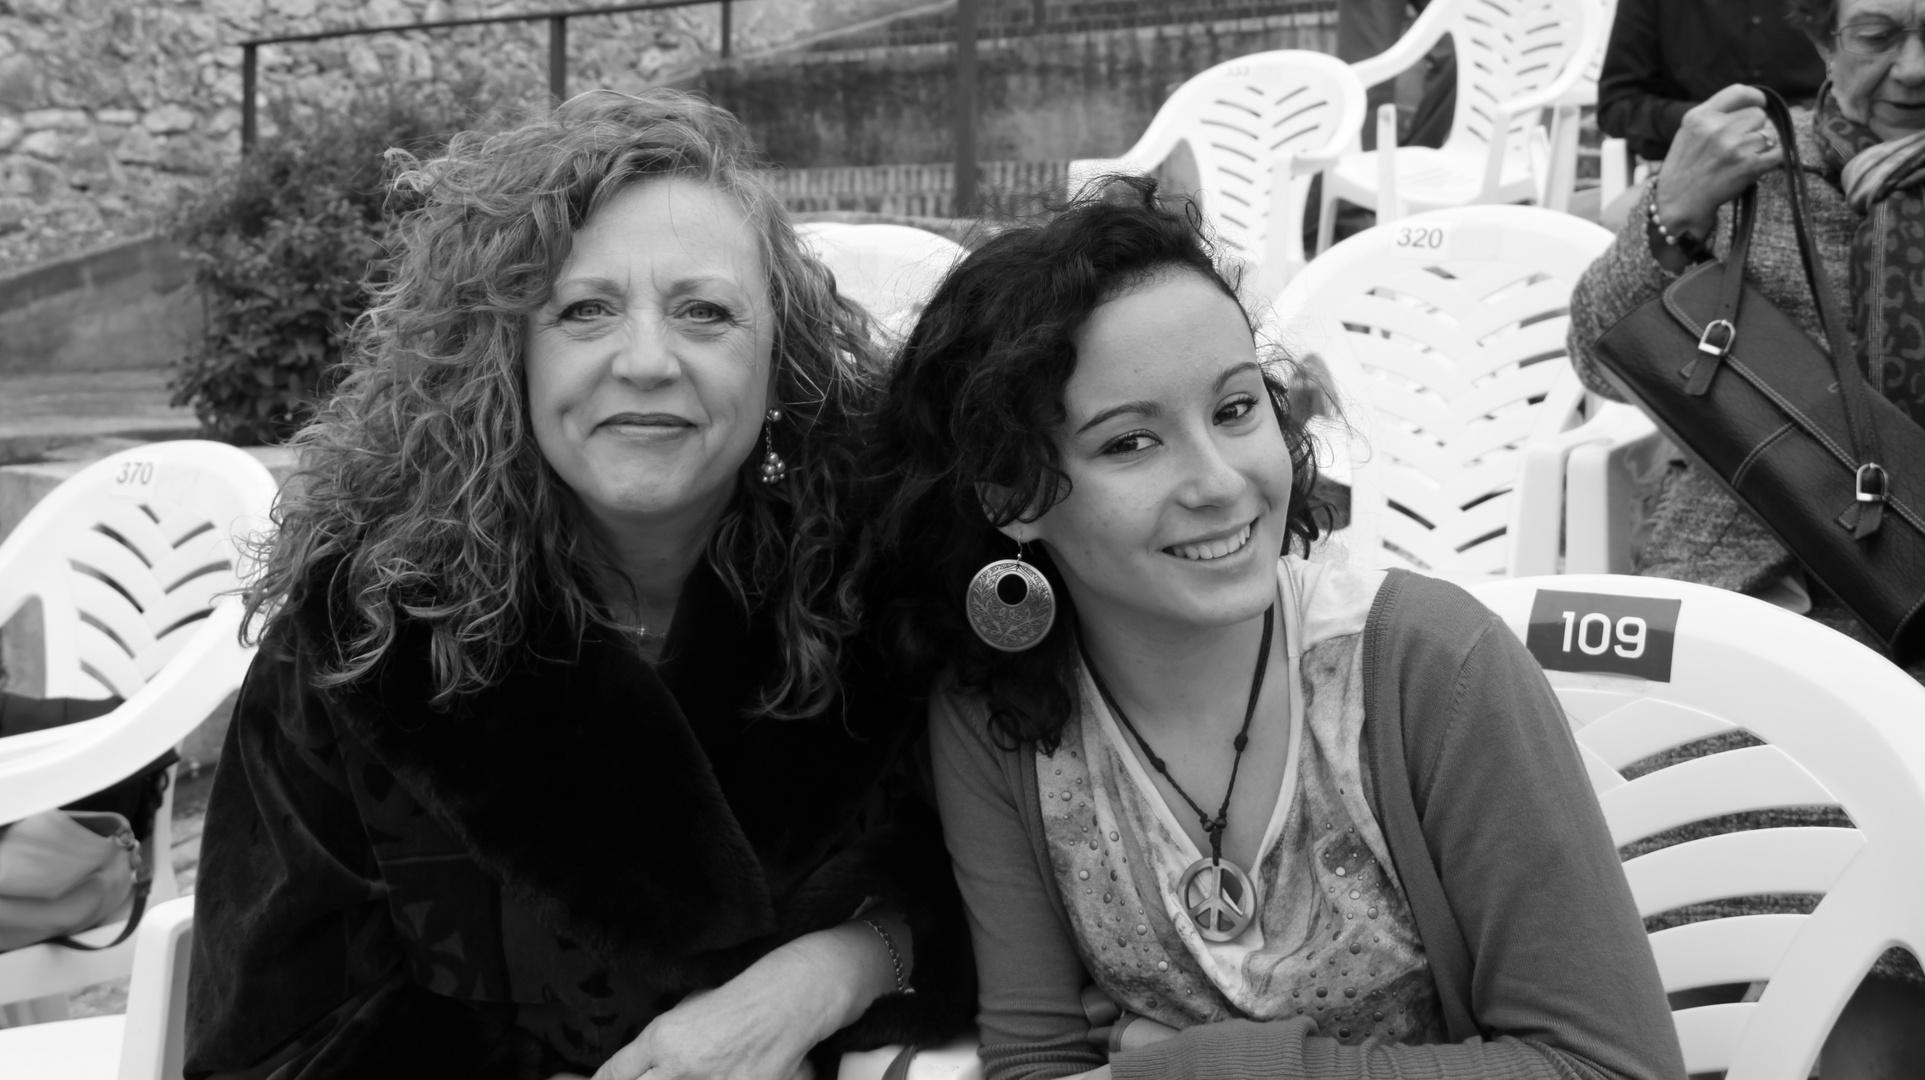 MIS CHICAS... Mi amiga Mariví, y mi hija Teresa...